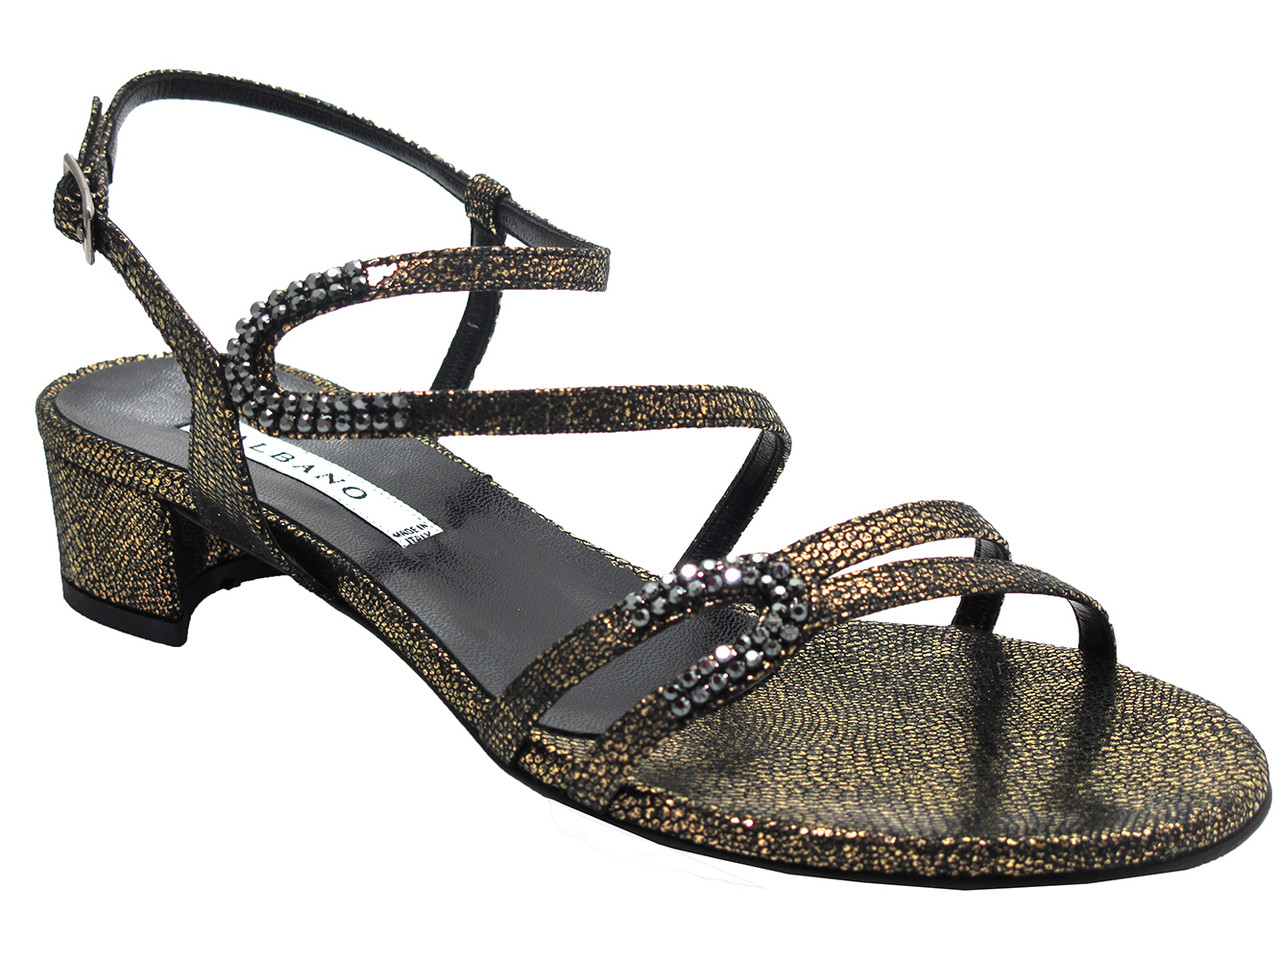 Low Heel Dressy Strappy Shimmer Sandal